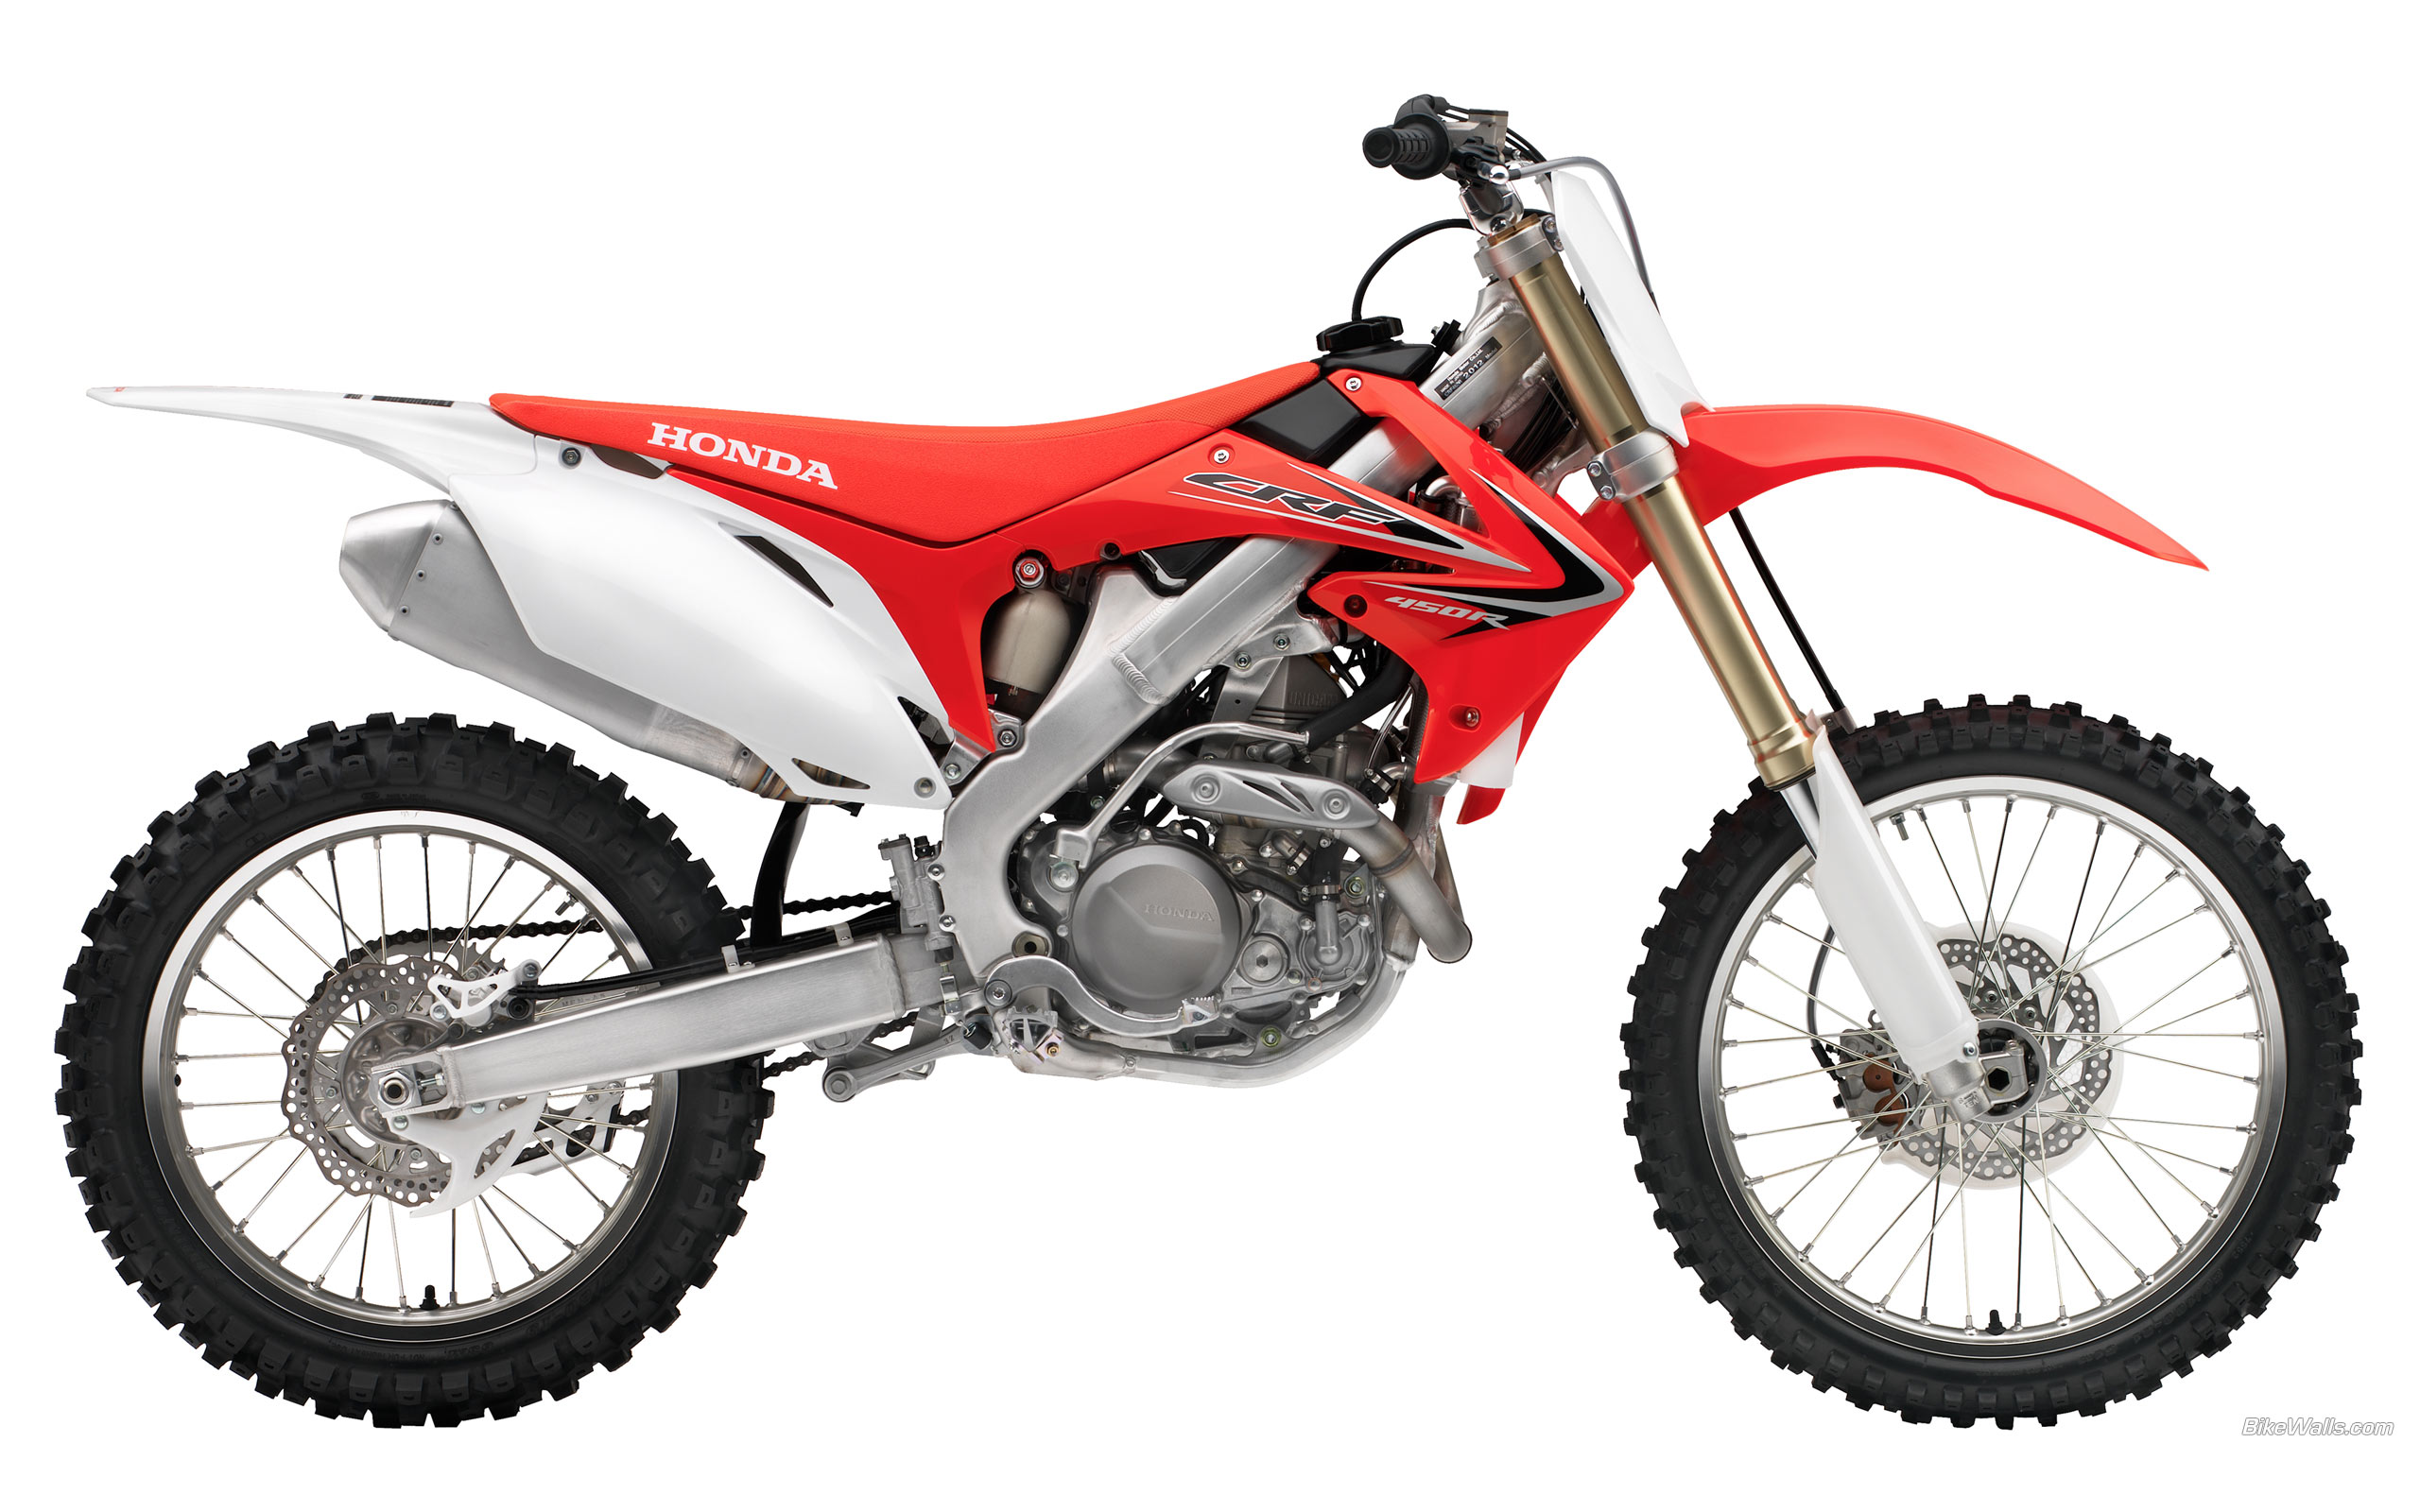 Honda Motocross Crf450 R Motorcycles Photo 31816496